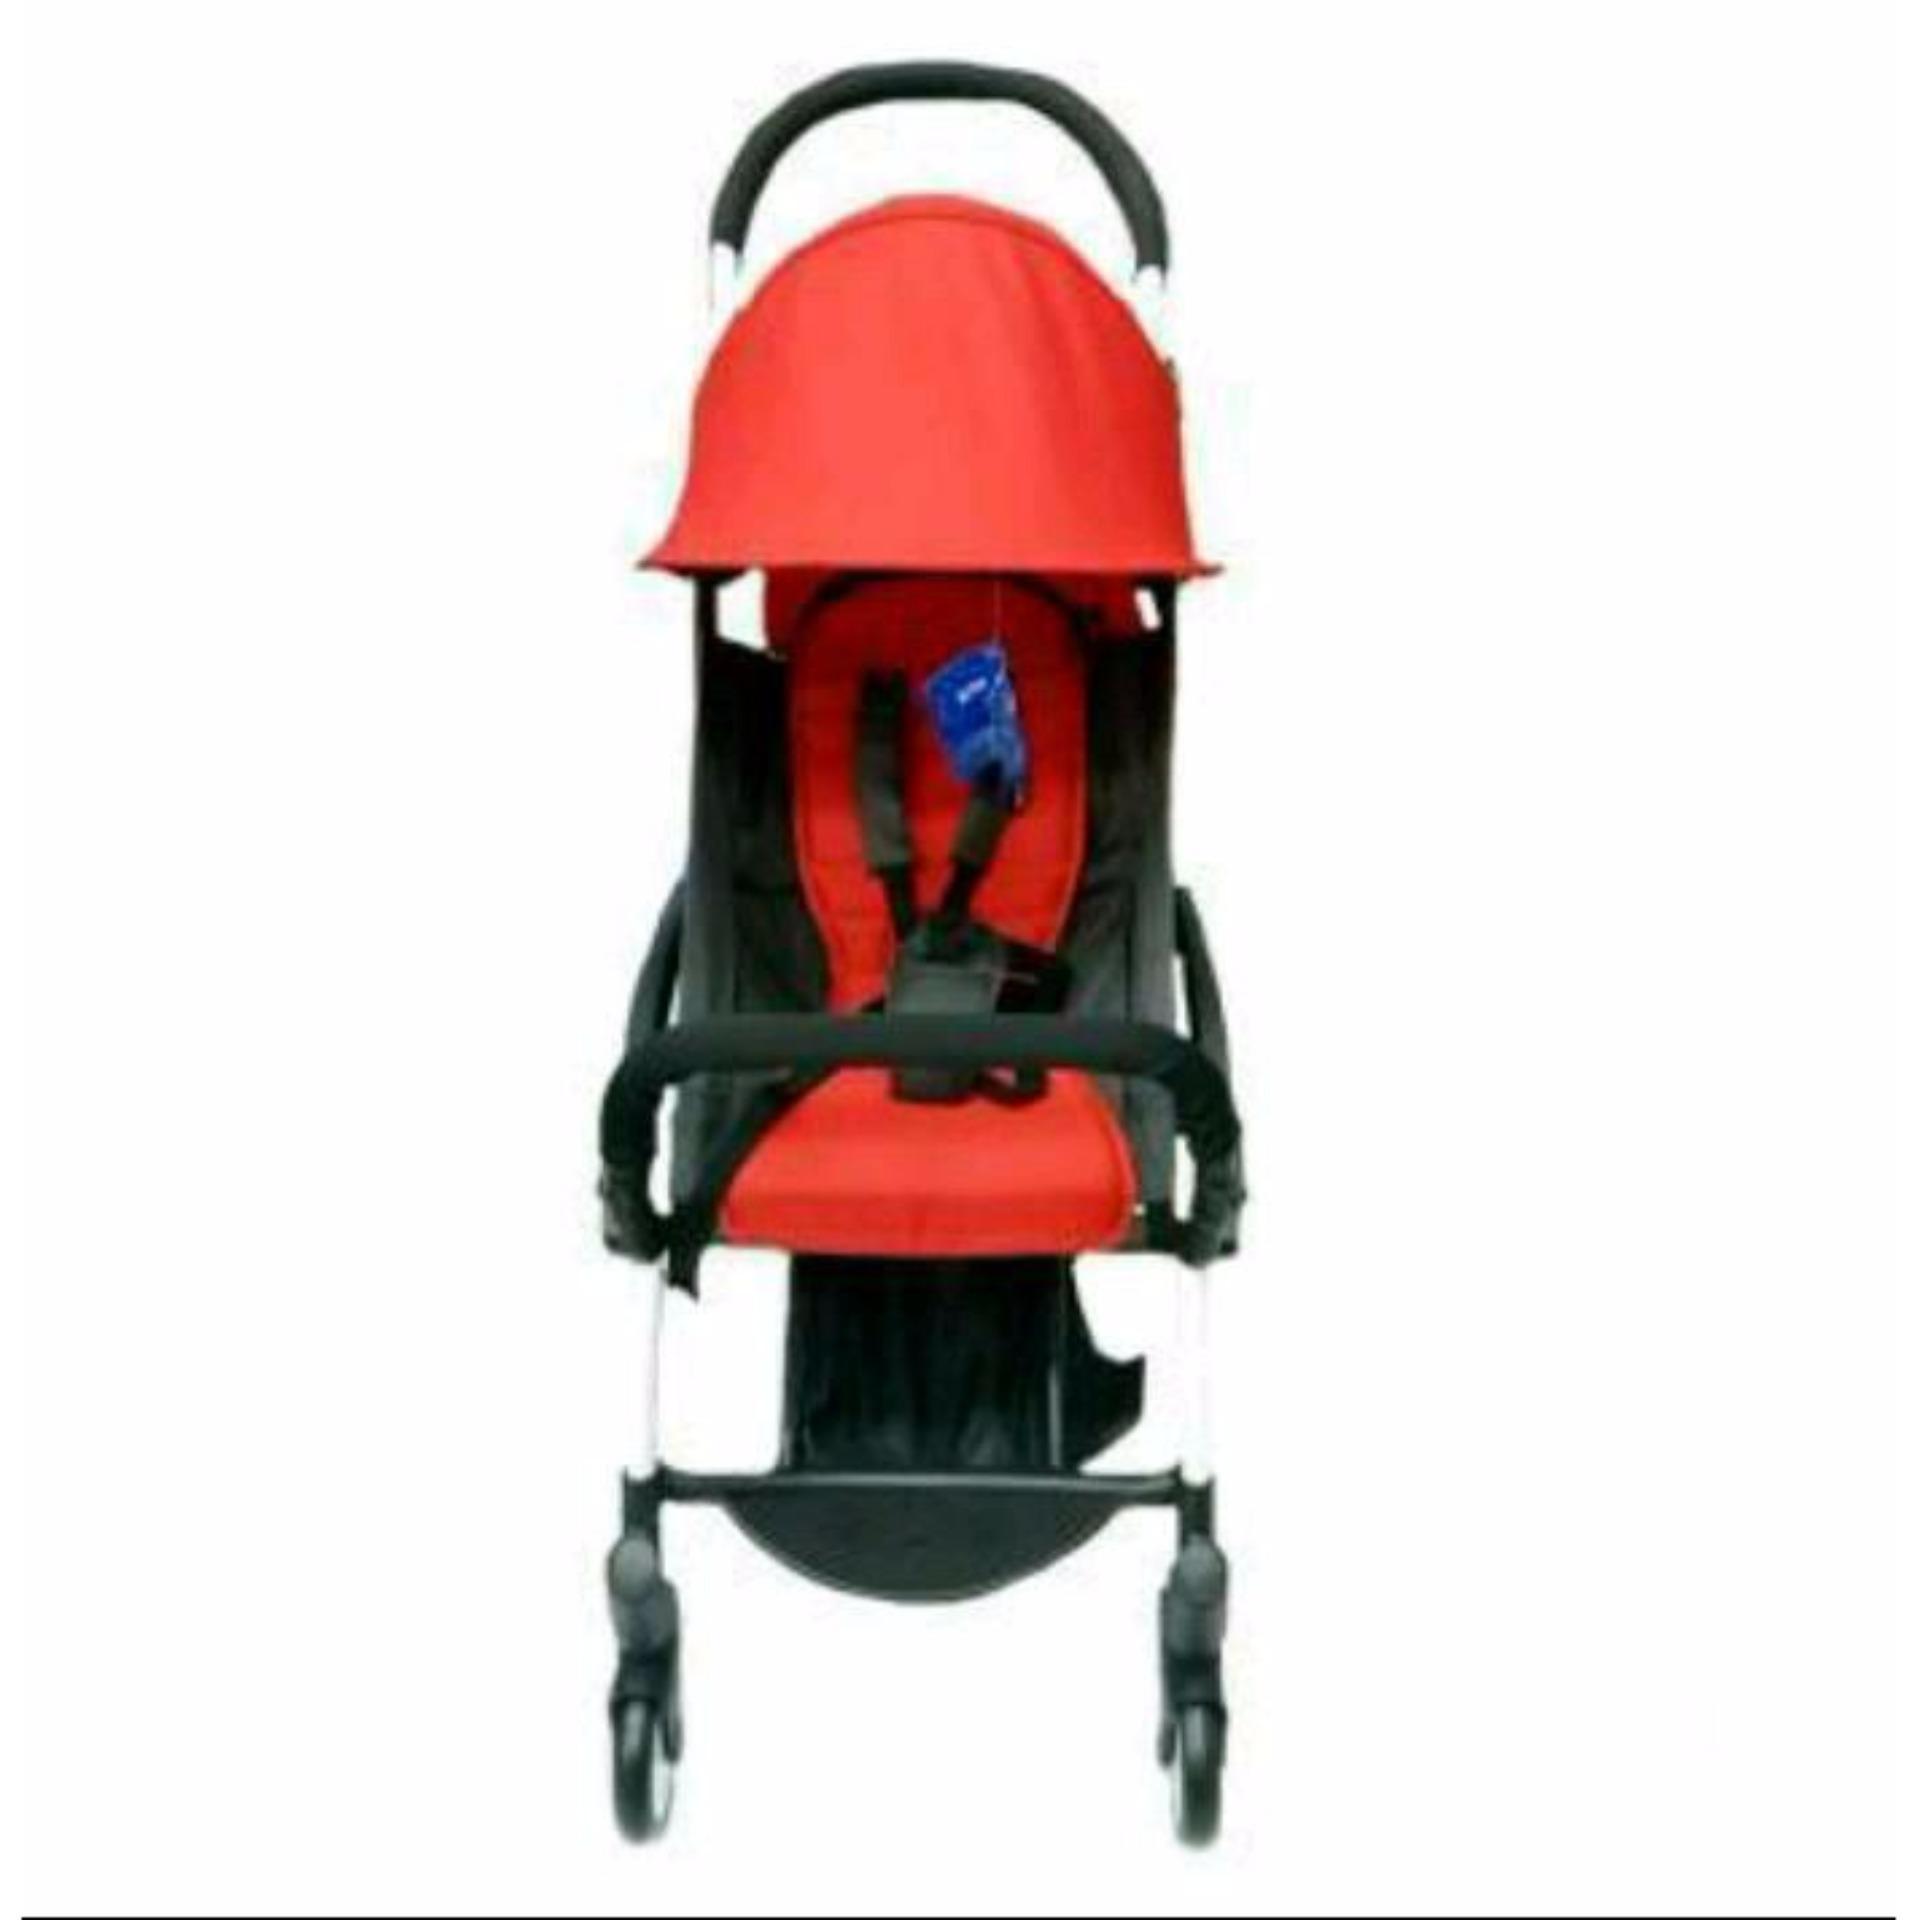 Seebaby Stroller Qq1 Cat Hijau A Big Deal Q5 Titi Kamal Pilihanku Babydoes Petite